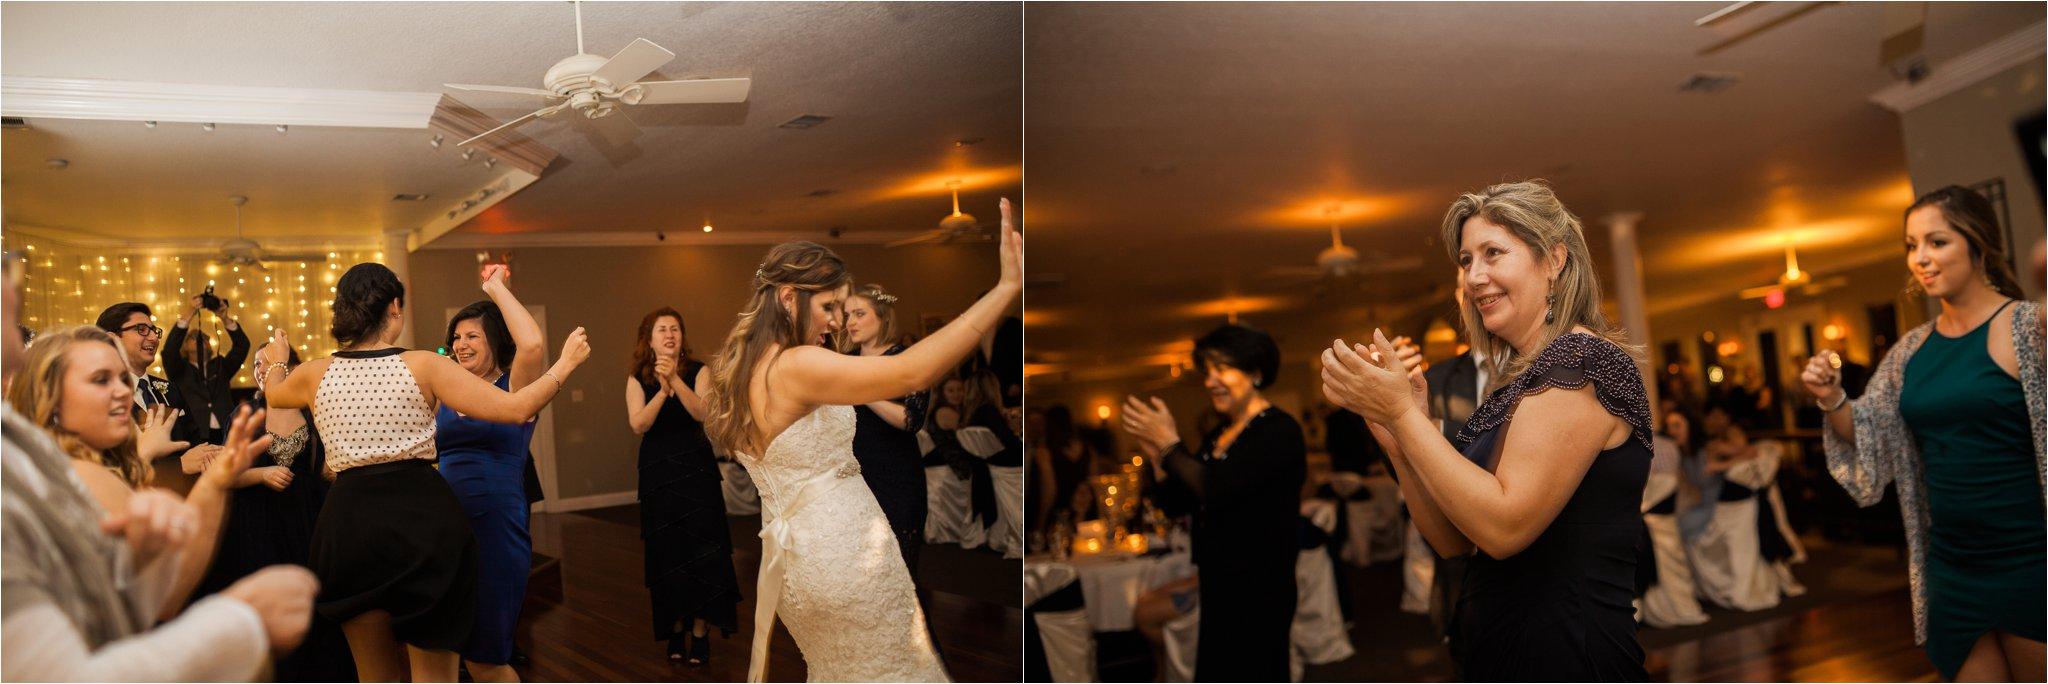 lunsford-wedding-1051.jpg